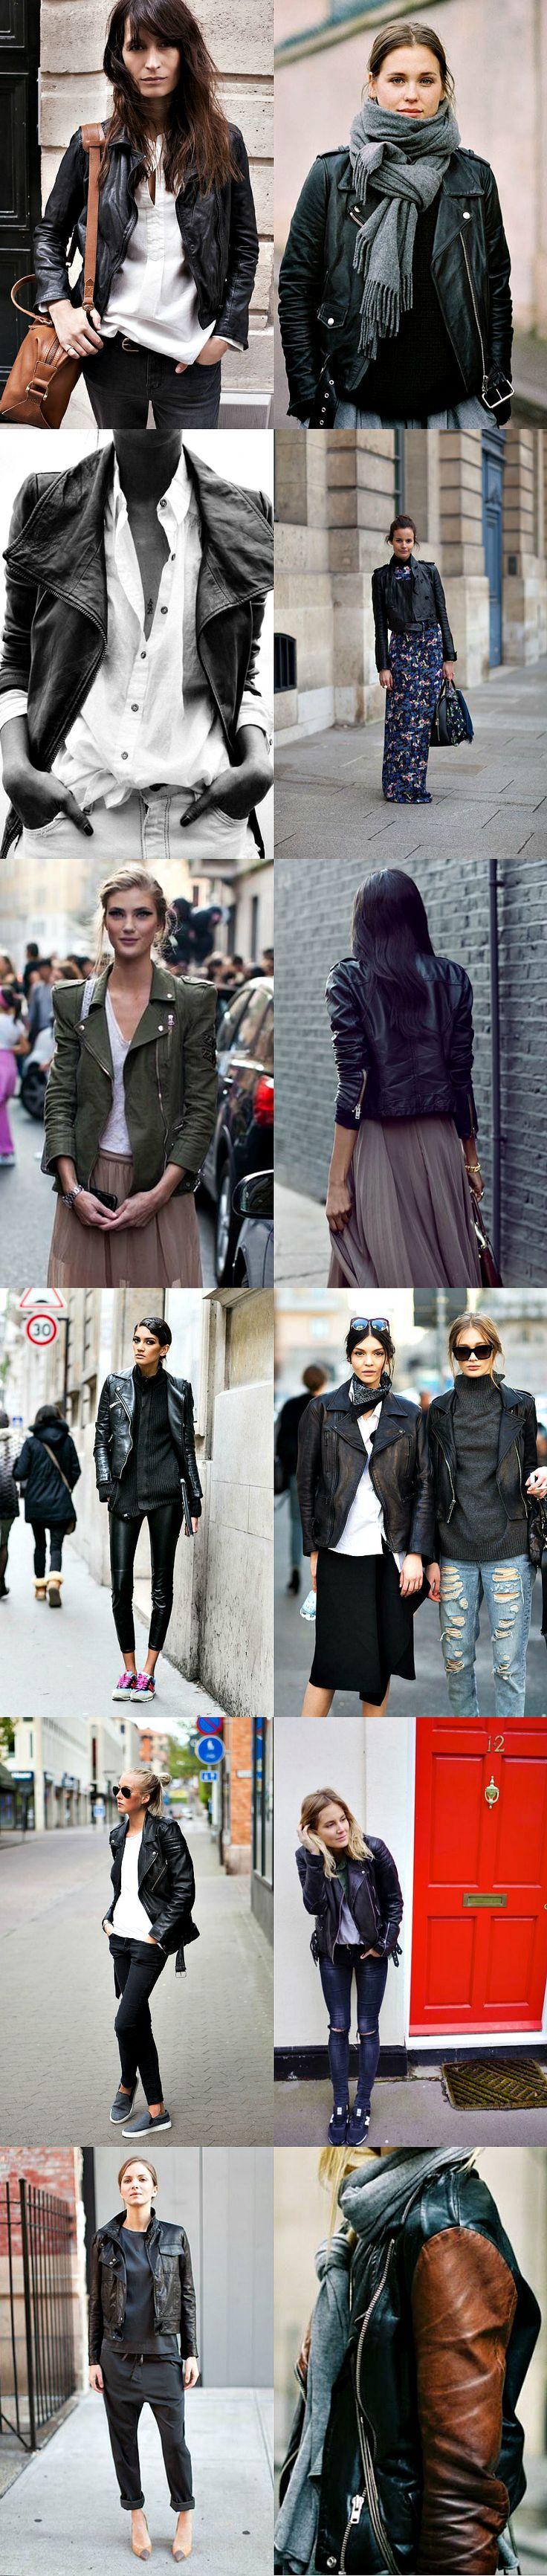 best my style images on pinterest feminine fashion fall